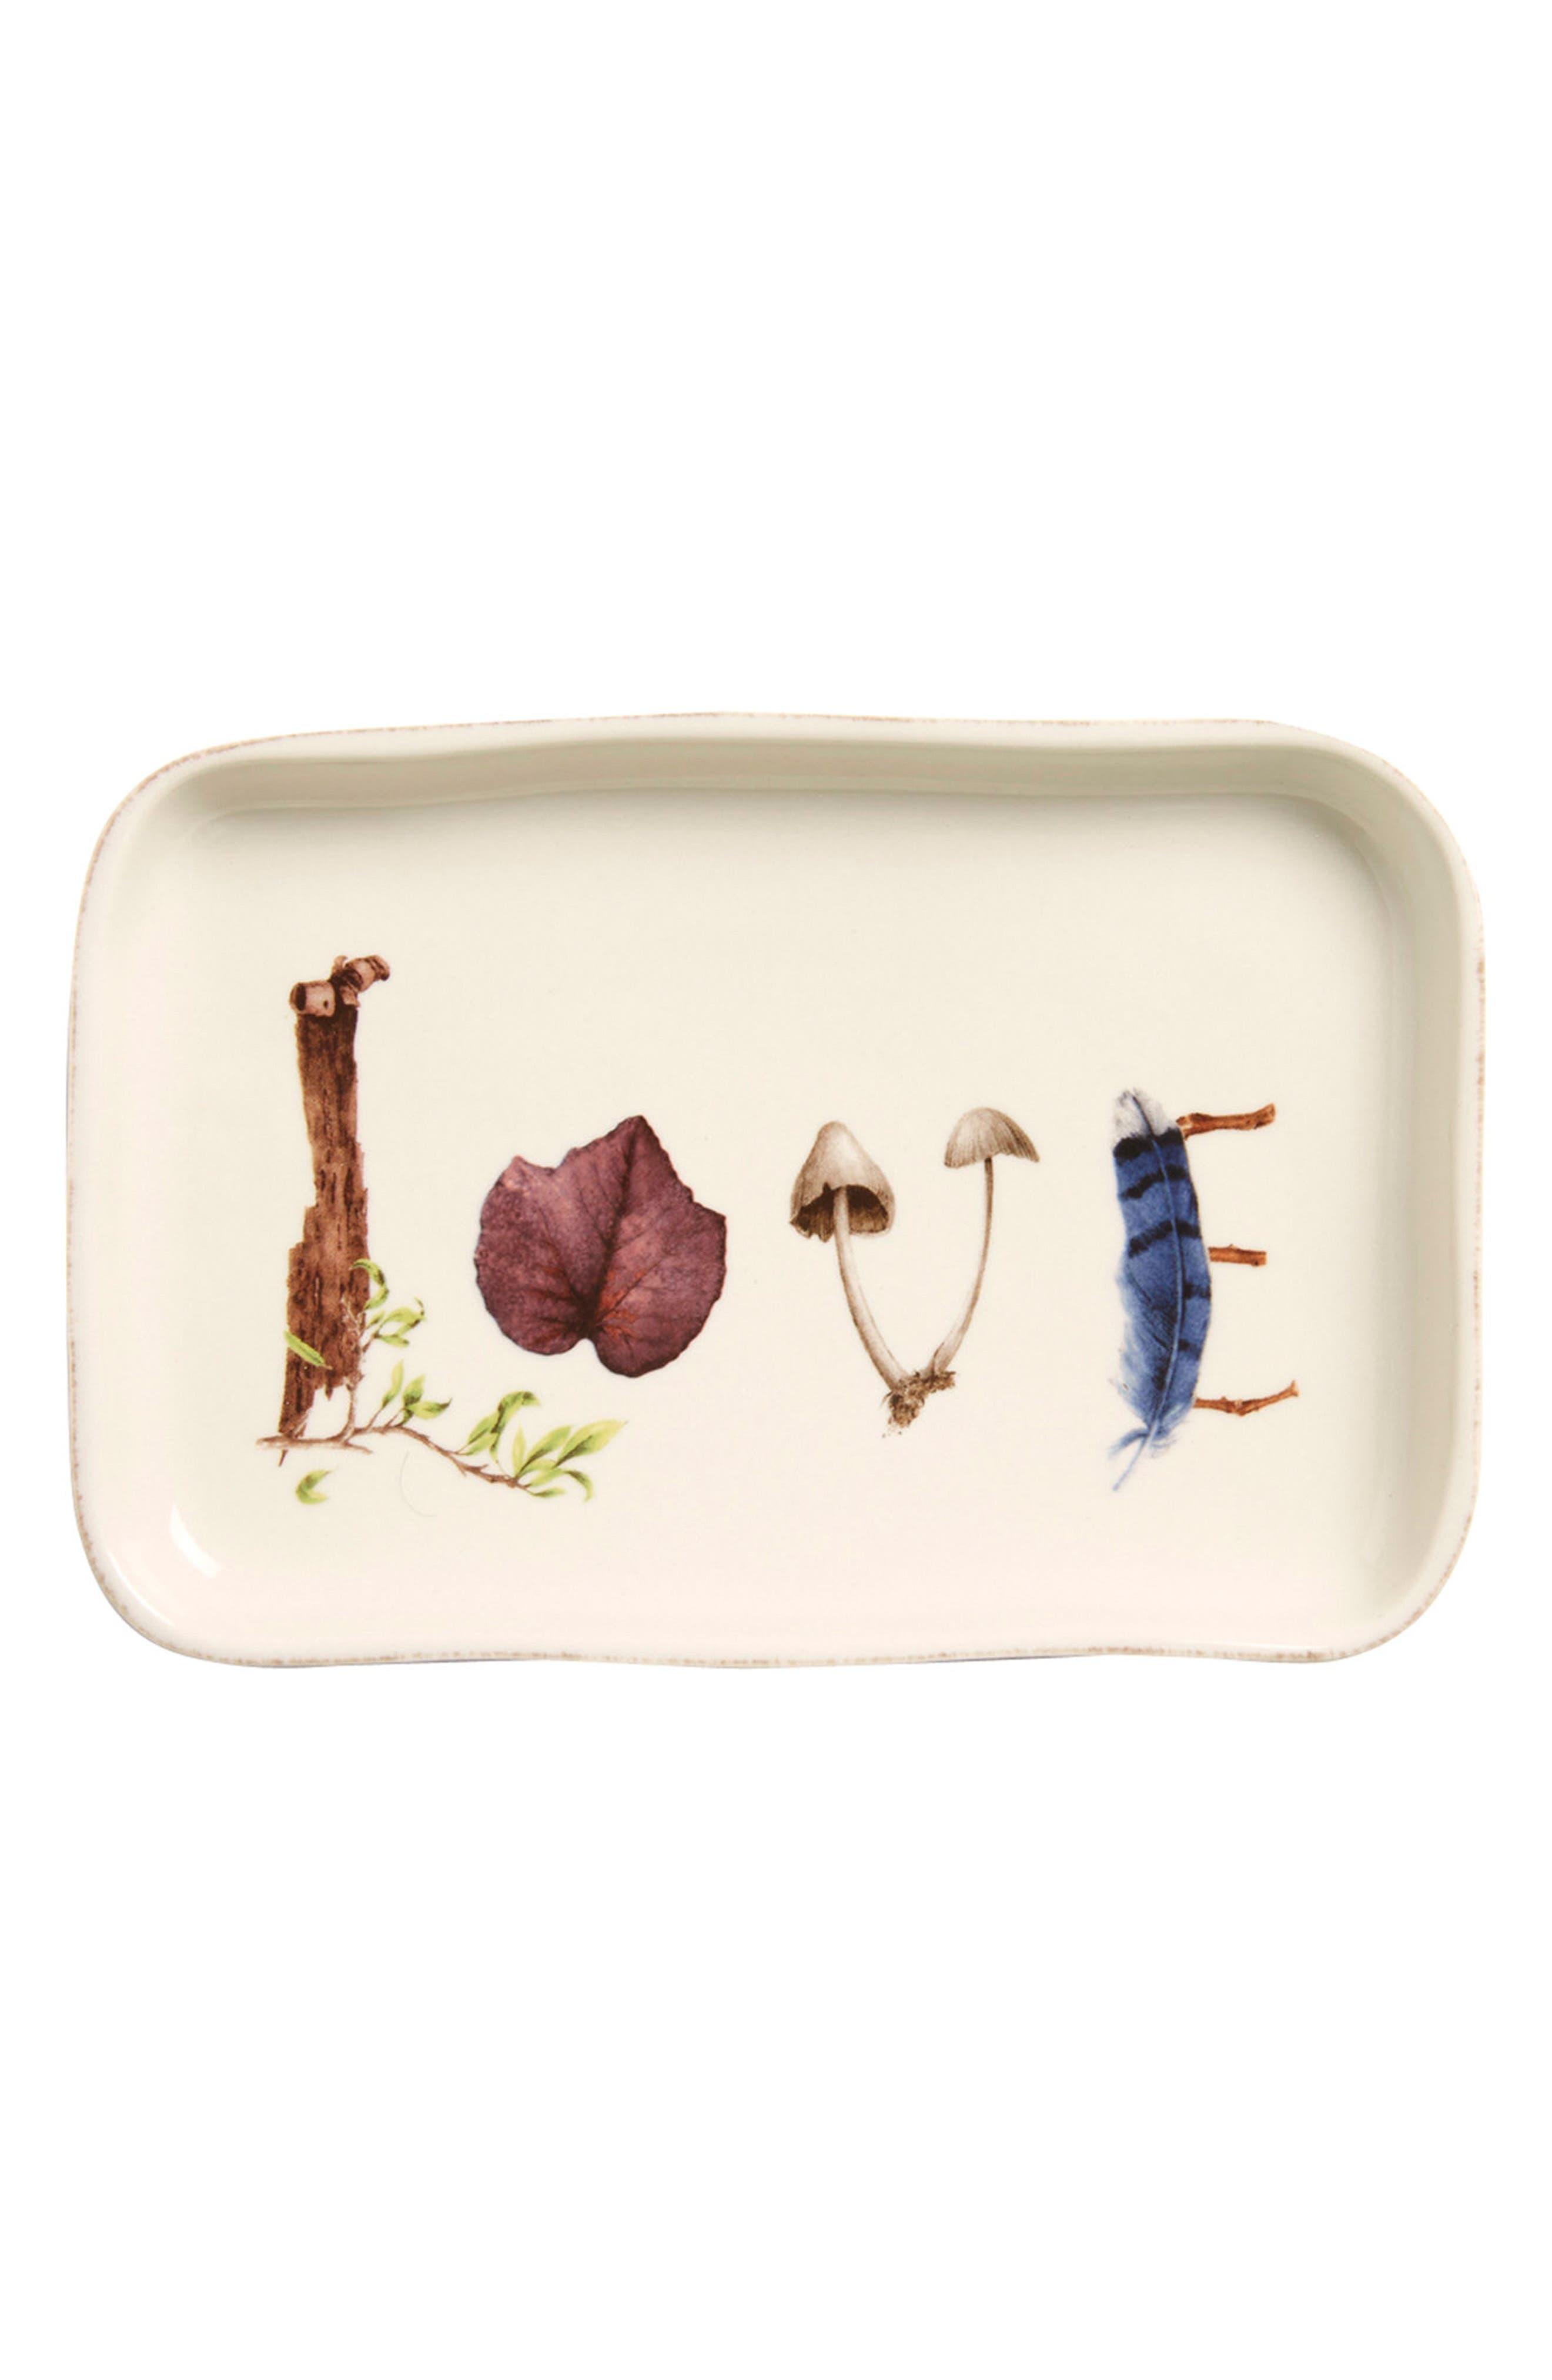 Forest Walk Love Ceramic Tray,                             Main thumbnail 1, color,                             CAF AU LAIT